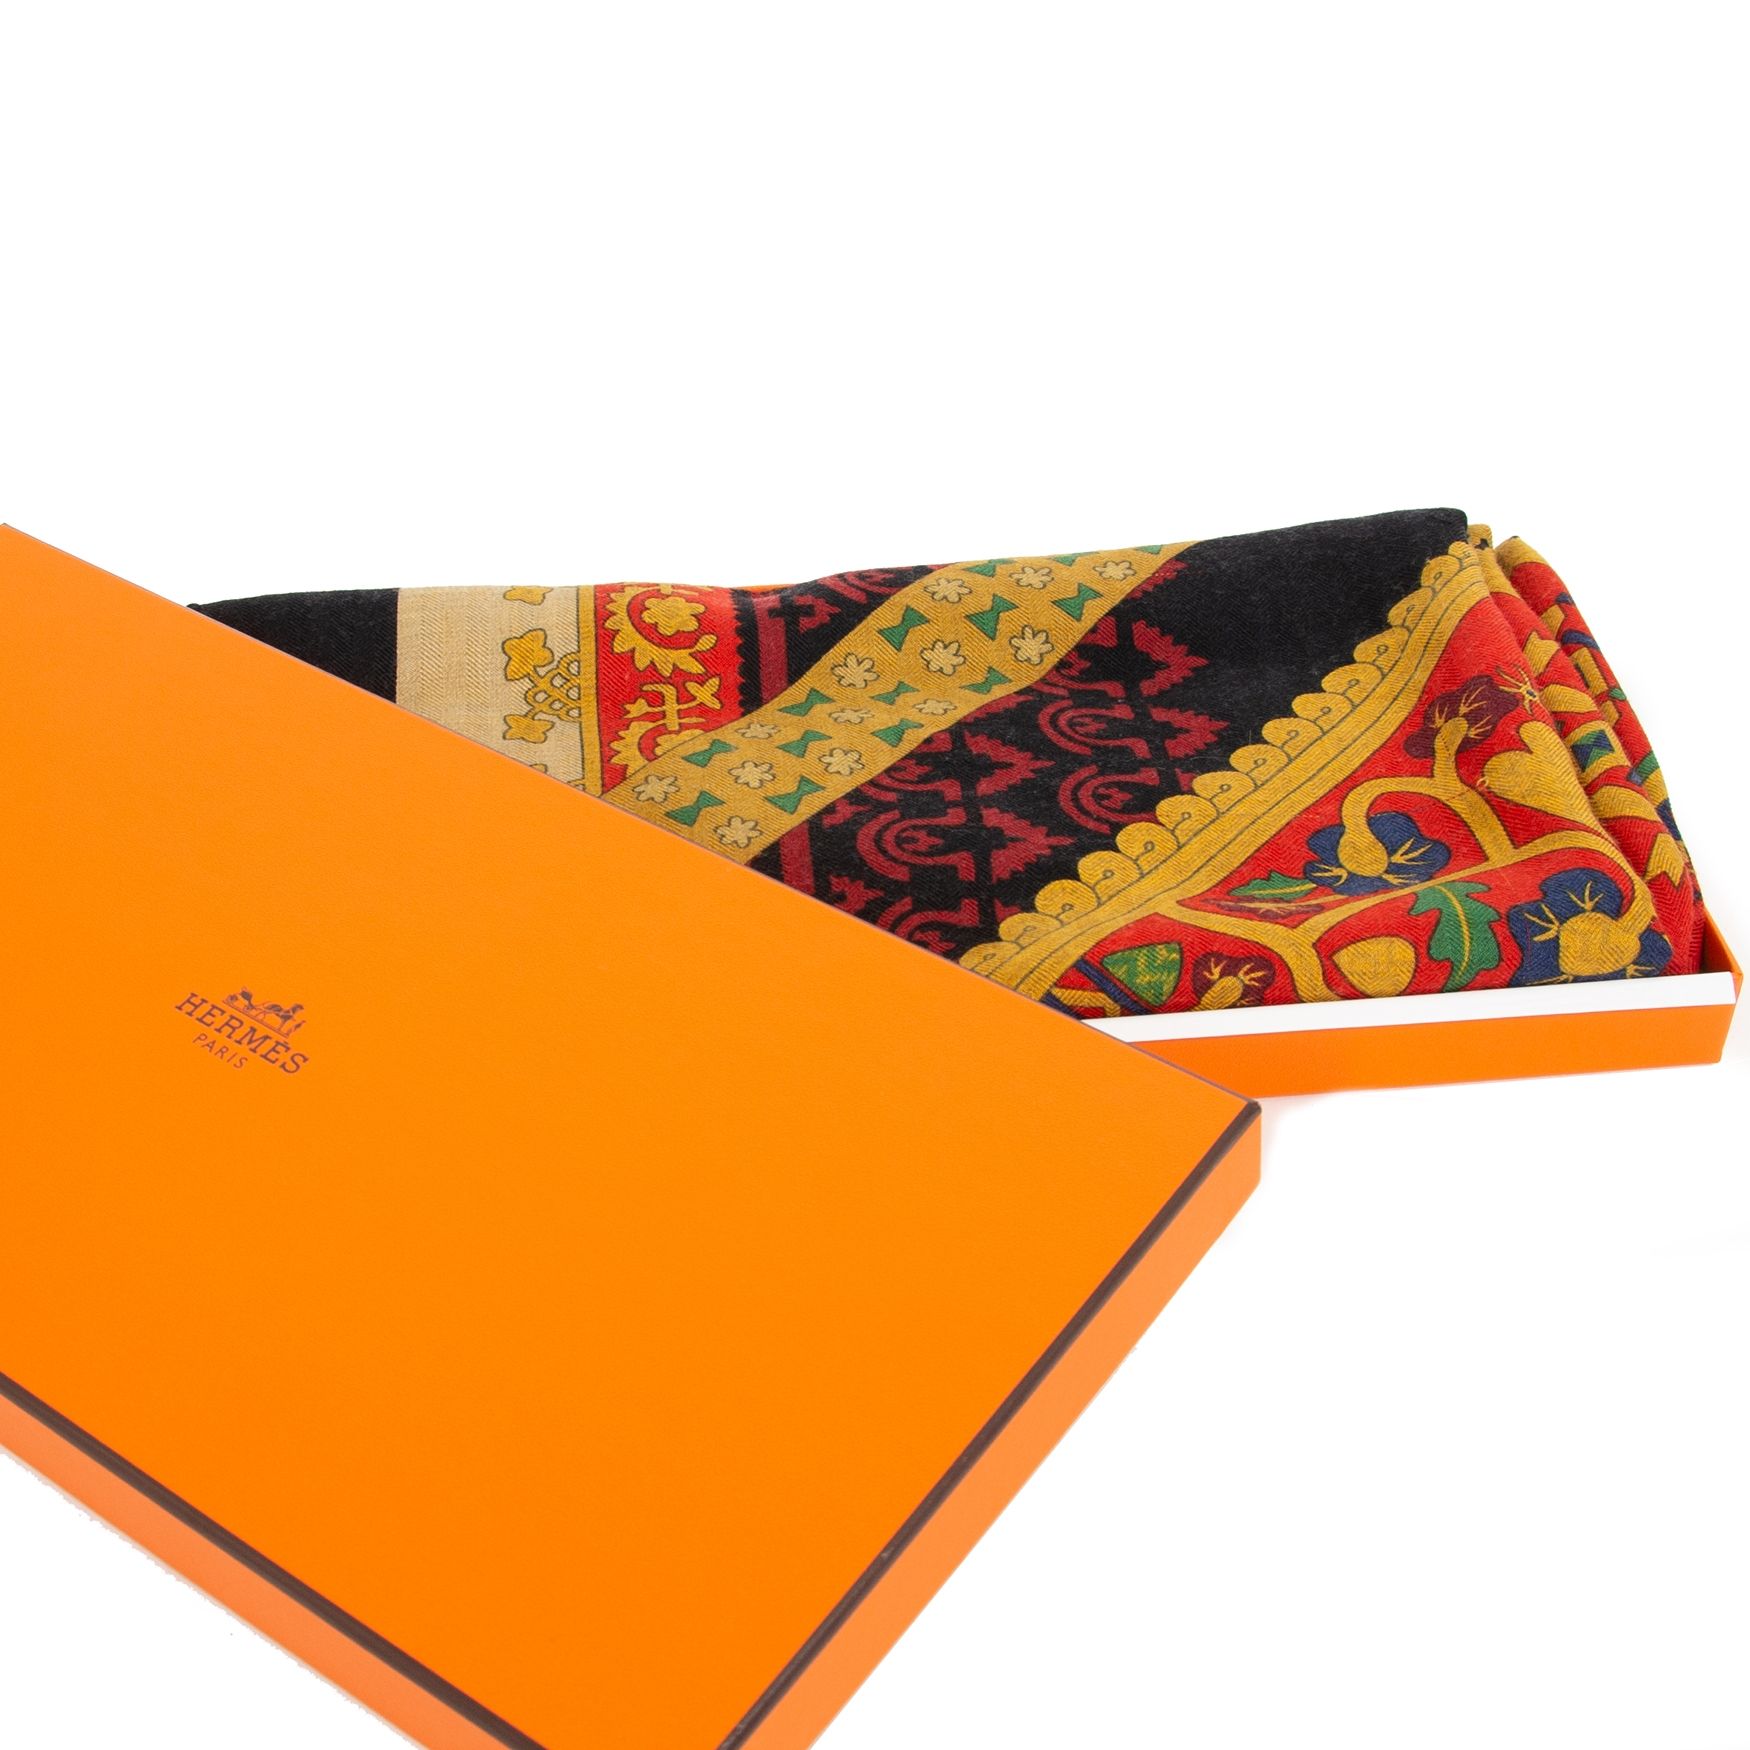 Hermès J. Abadie Brin d'Or Cashmere and Silk Shawl